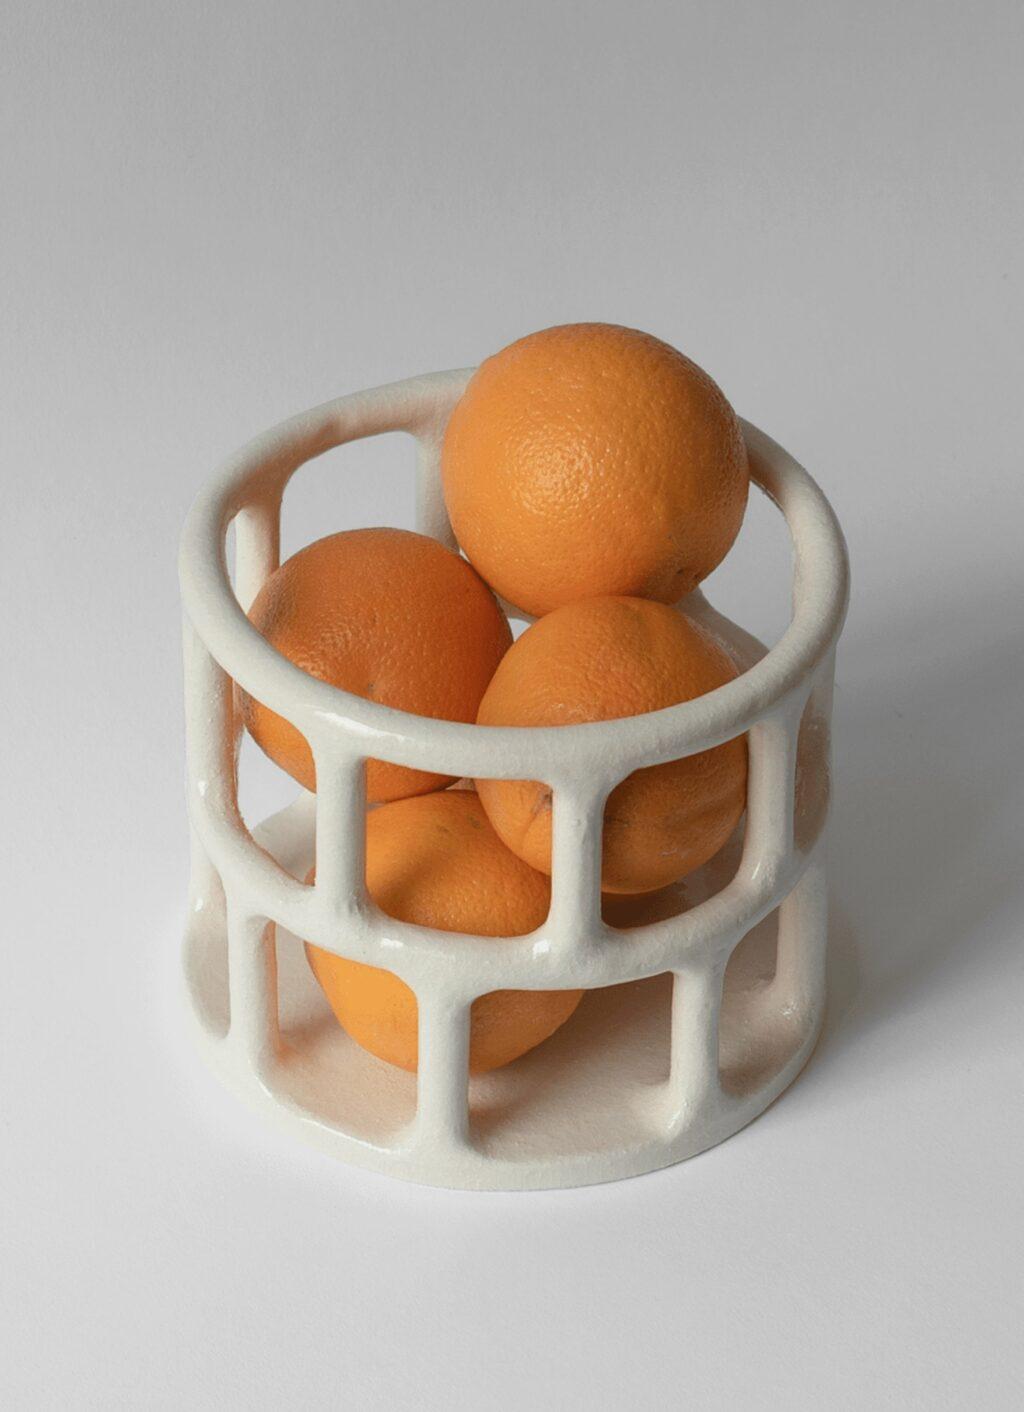 Solenne Belloir- Cylindrical Basket - Glazed Stoneware - White